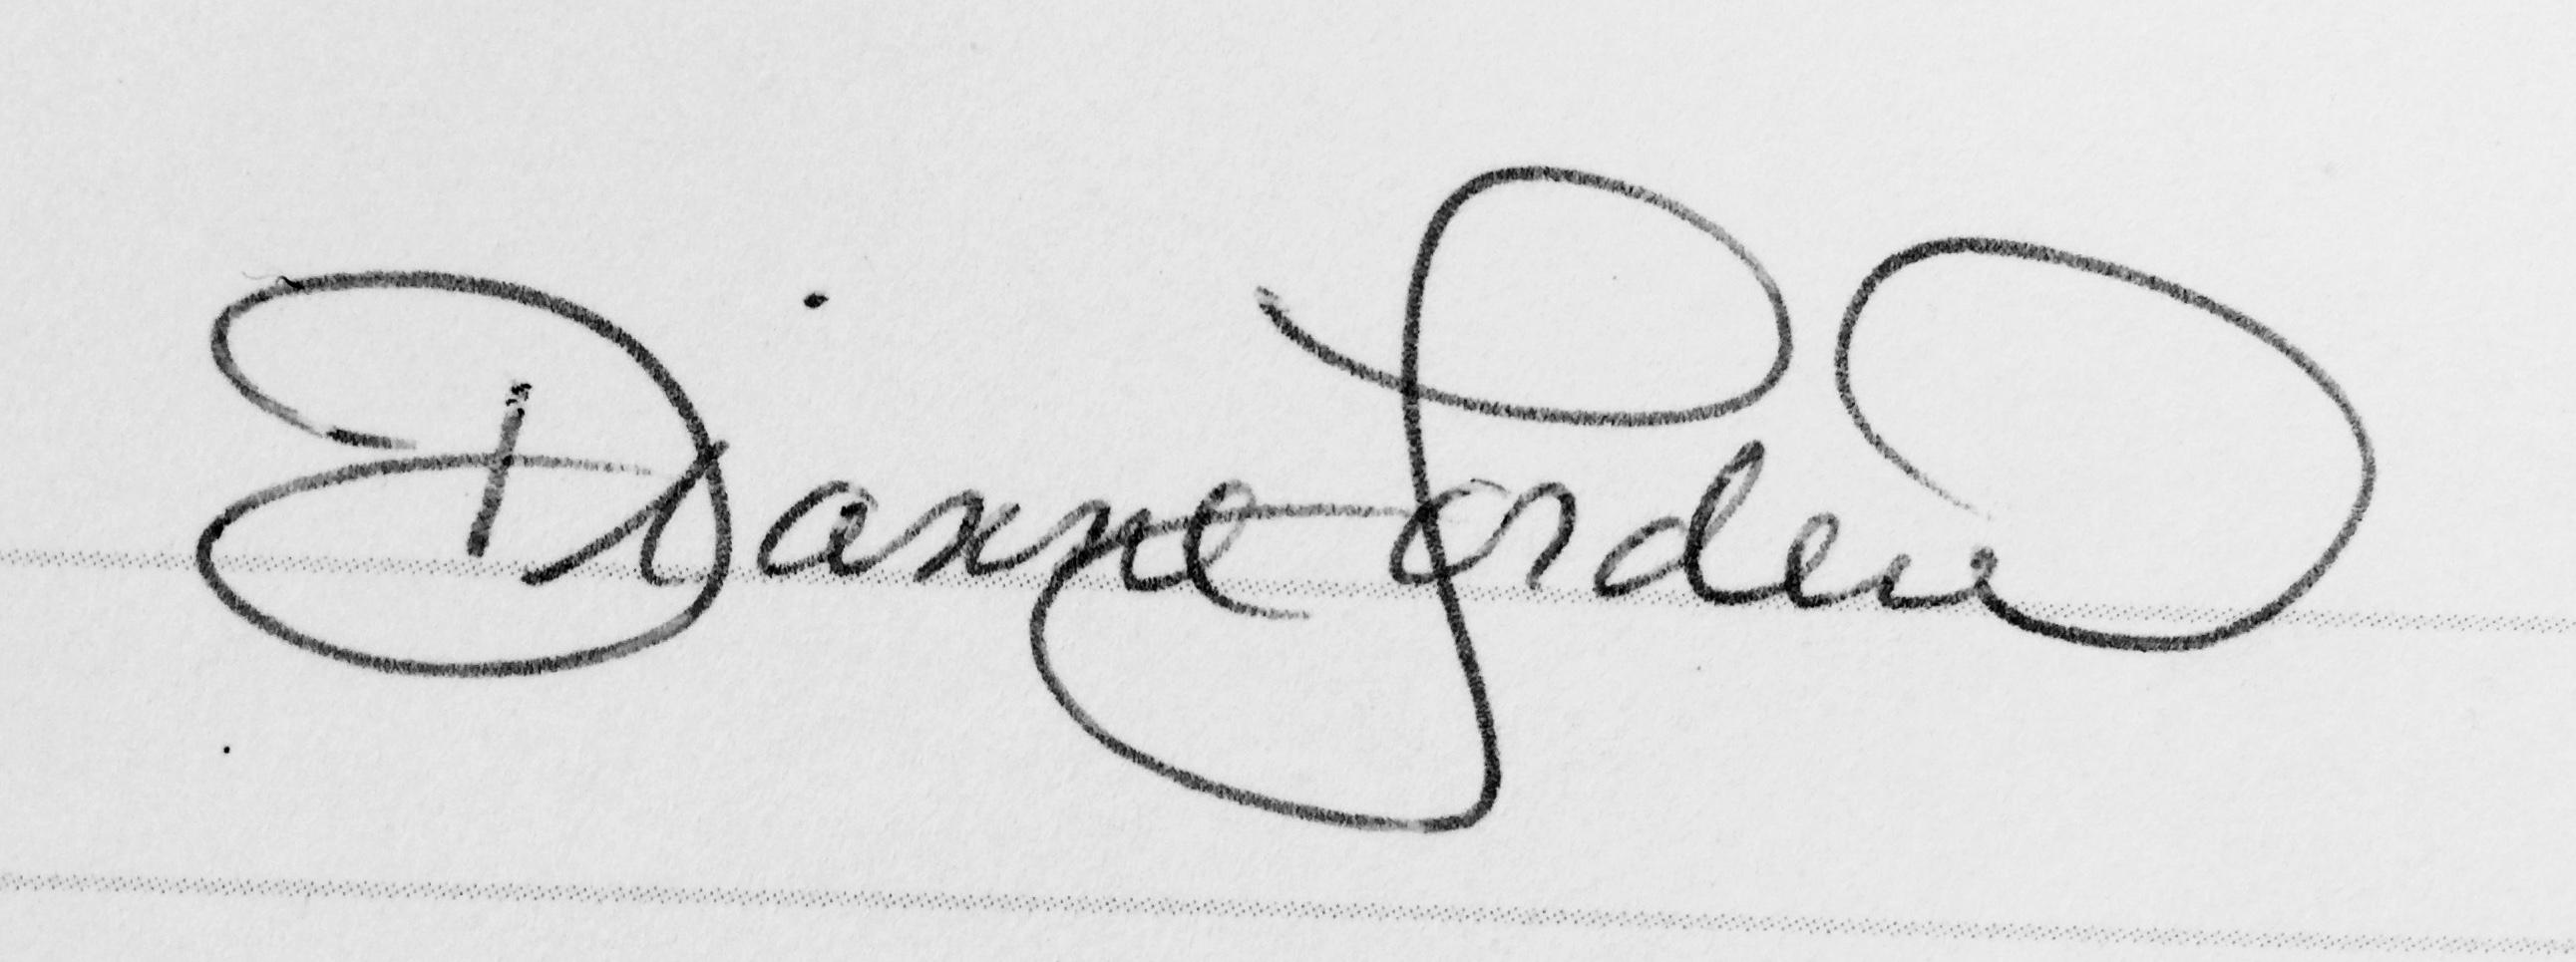 Dianne Lorden Signature